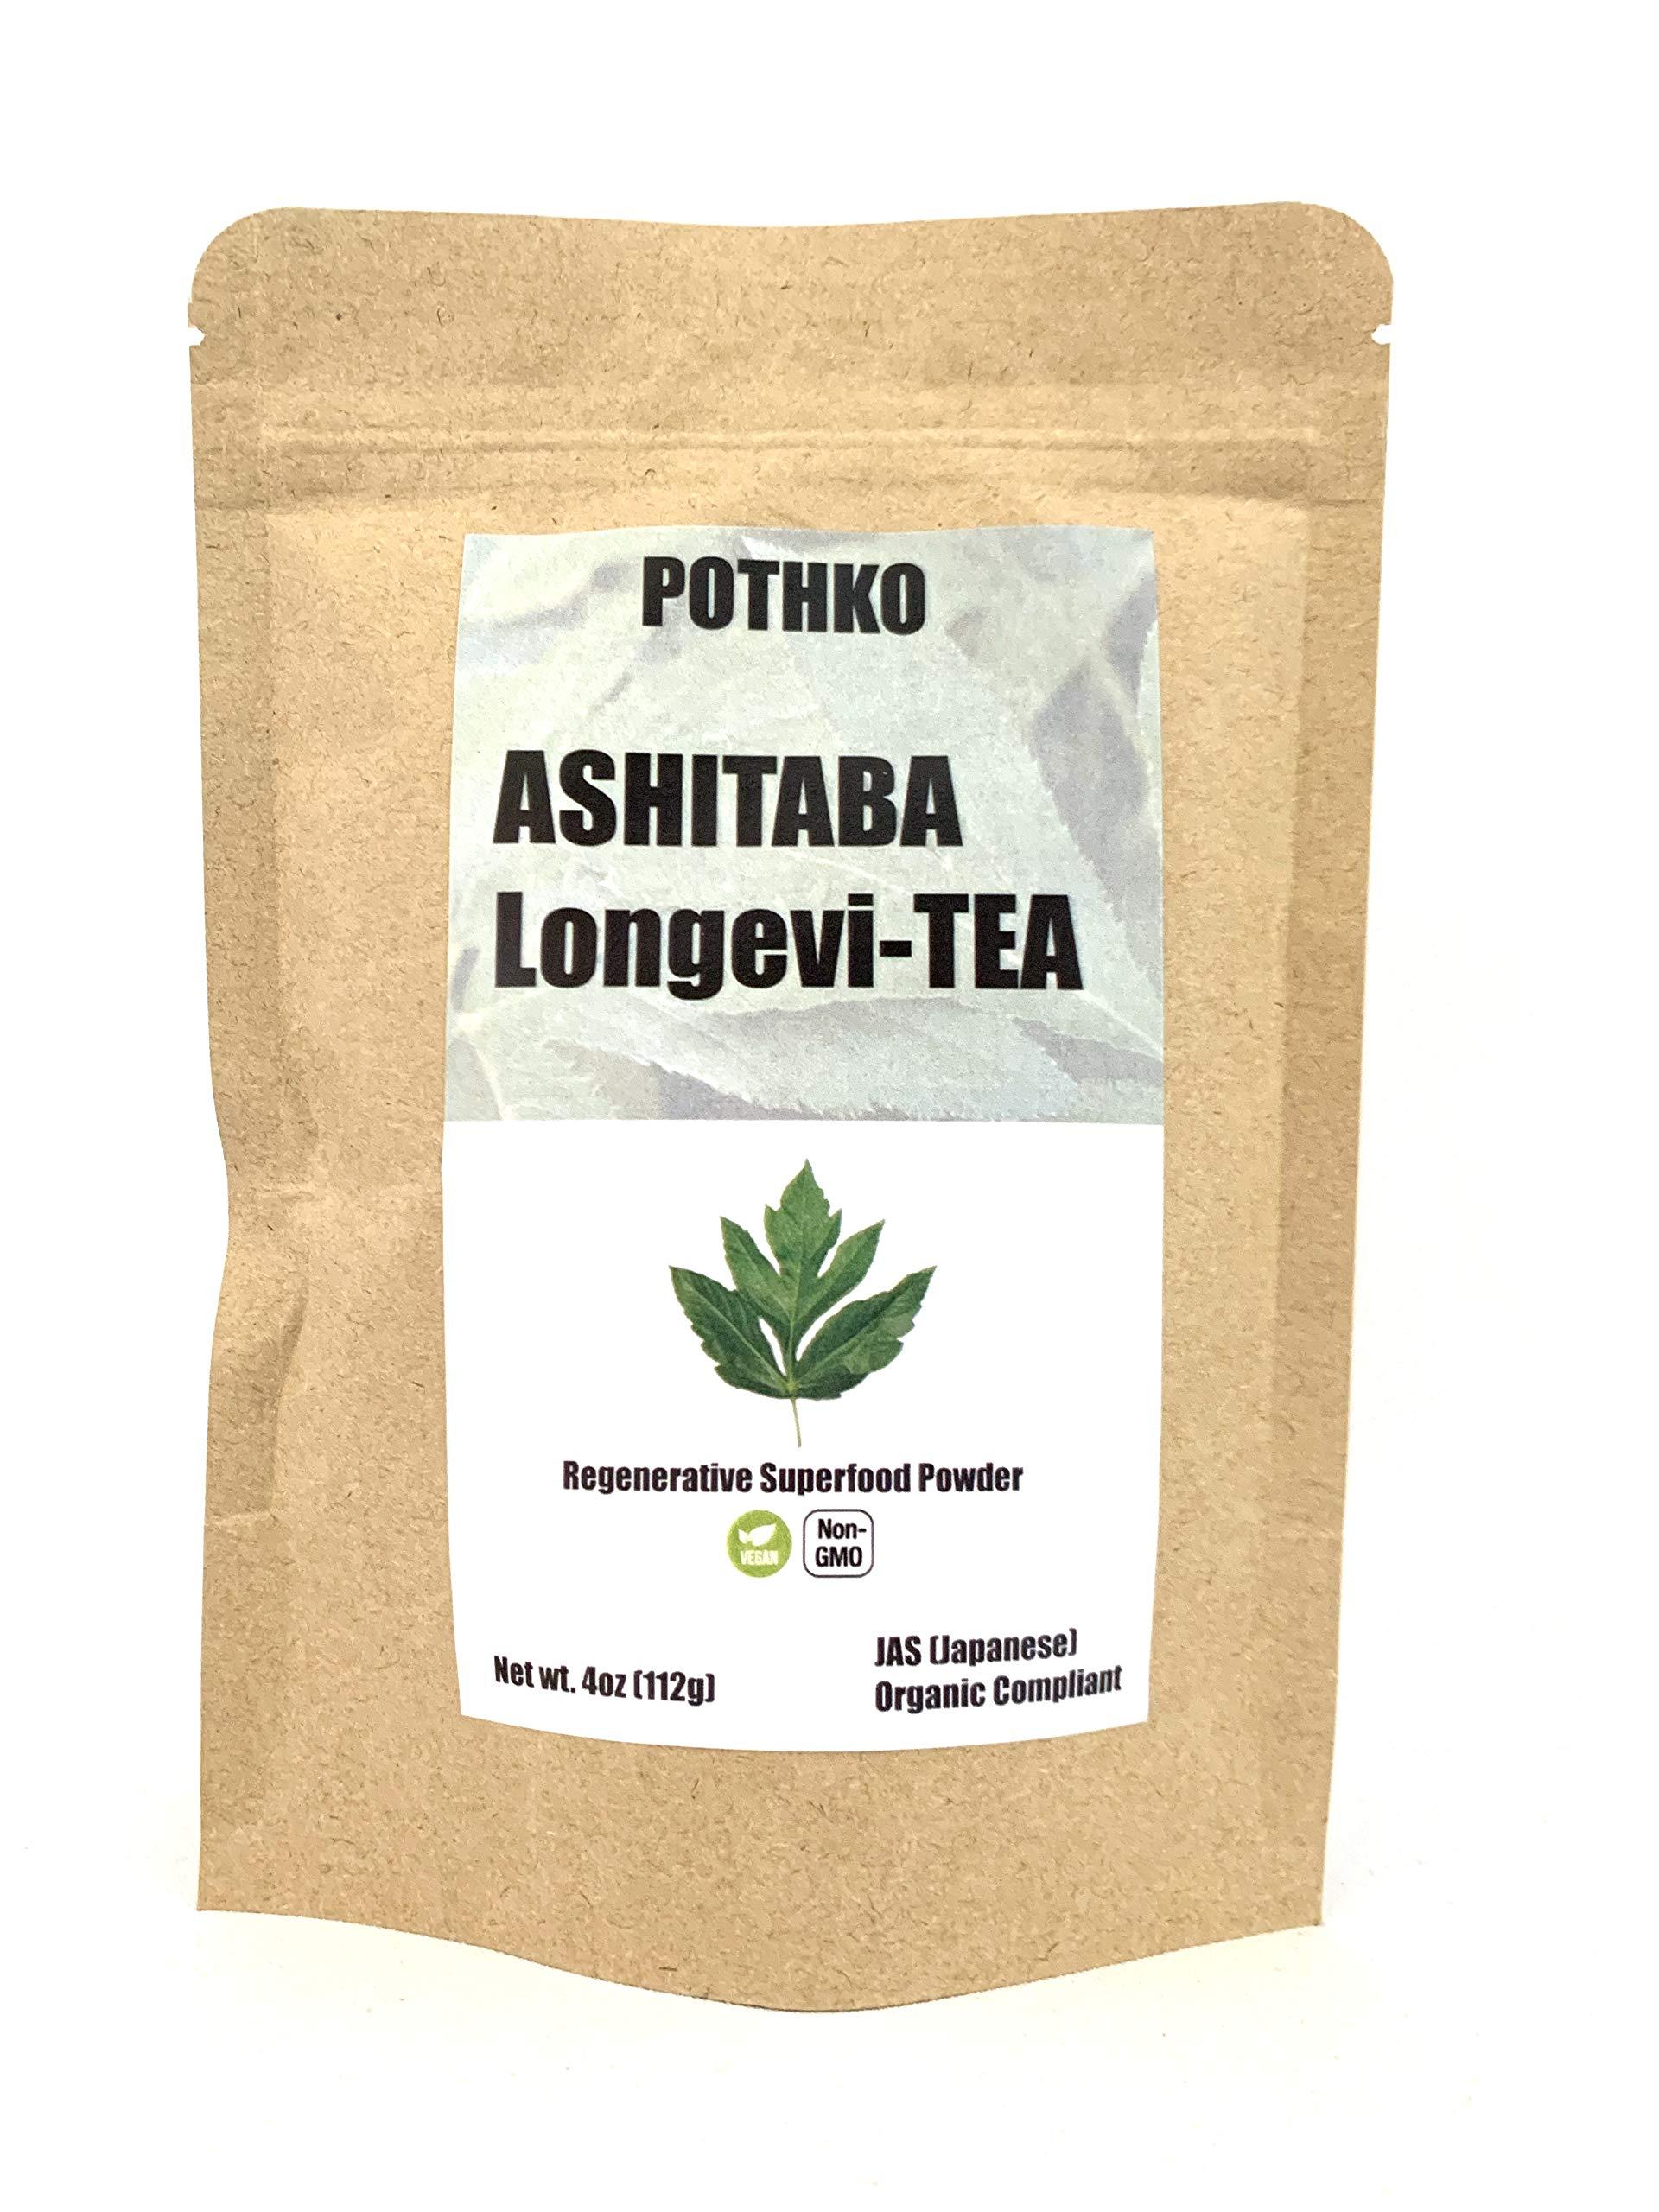 JAS Organic Ashitaba Longevi-tea Powder (4oz value bag) - Like Matcha without the Caffeine - Keto-Friendly - Mild Flavor, No Strange Taste - Longevity and Anti-aging - Antioxidants - Superfood Greens